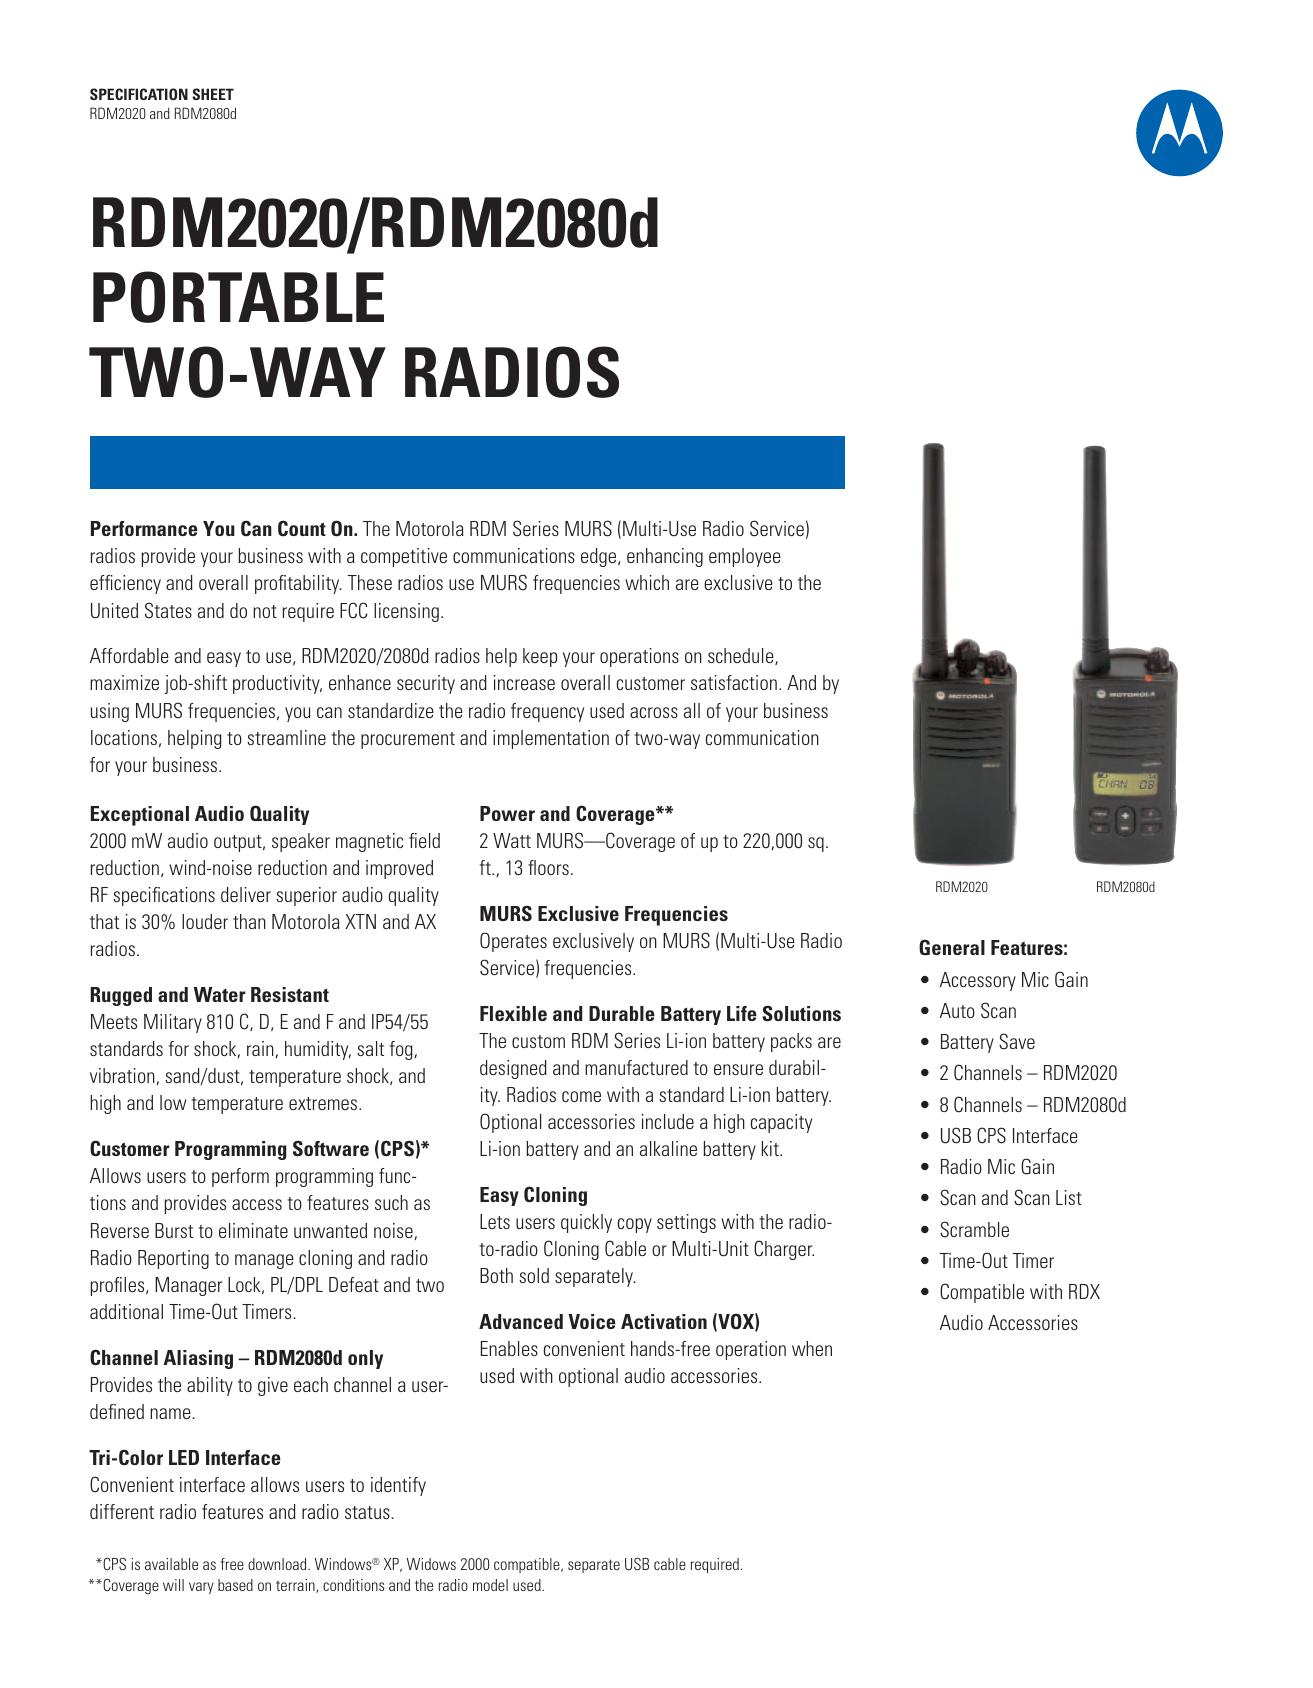 RDM2020/RDM2080d PORTABLE TWO-WAY   manualzz com